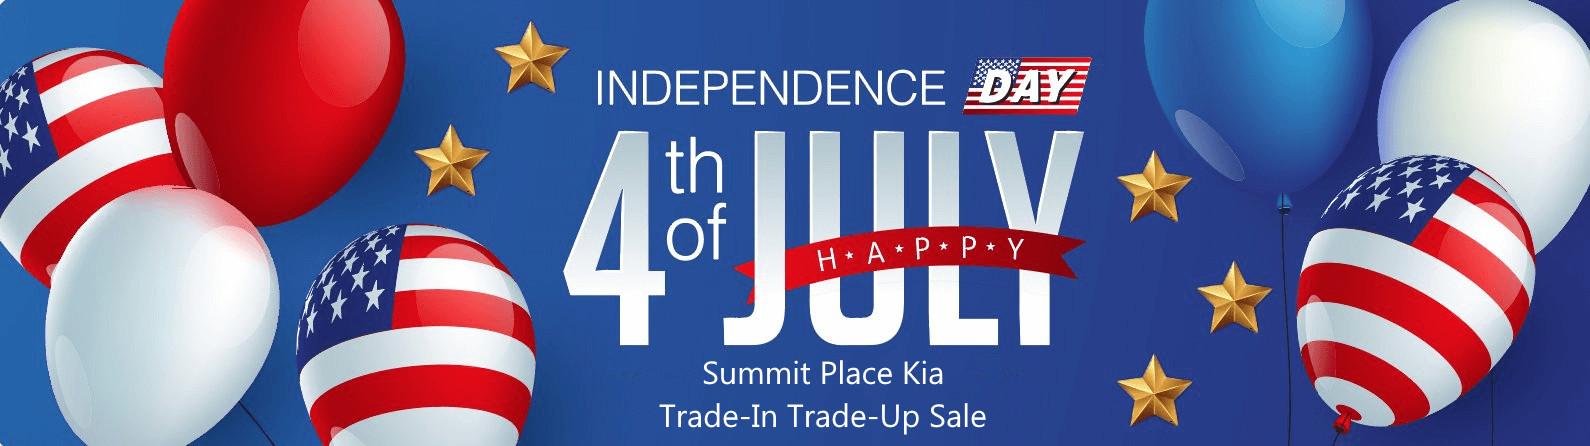 4th of July Kia Car Sale